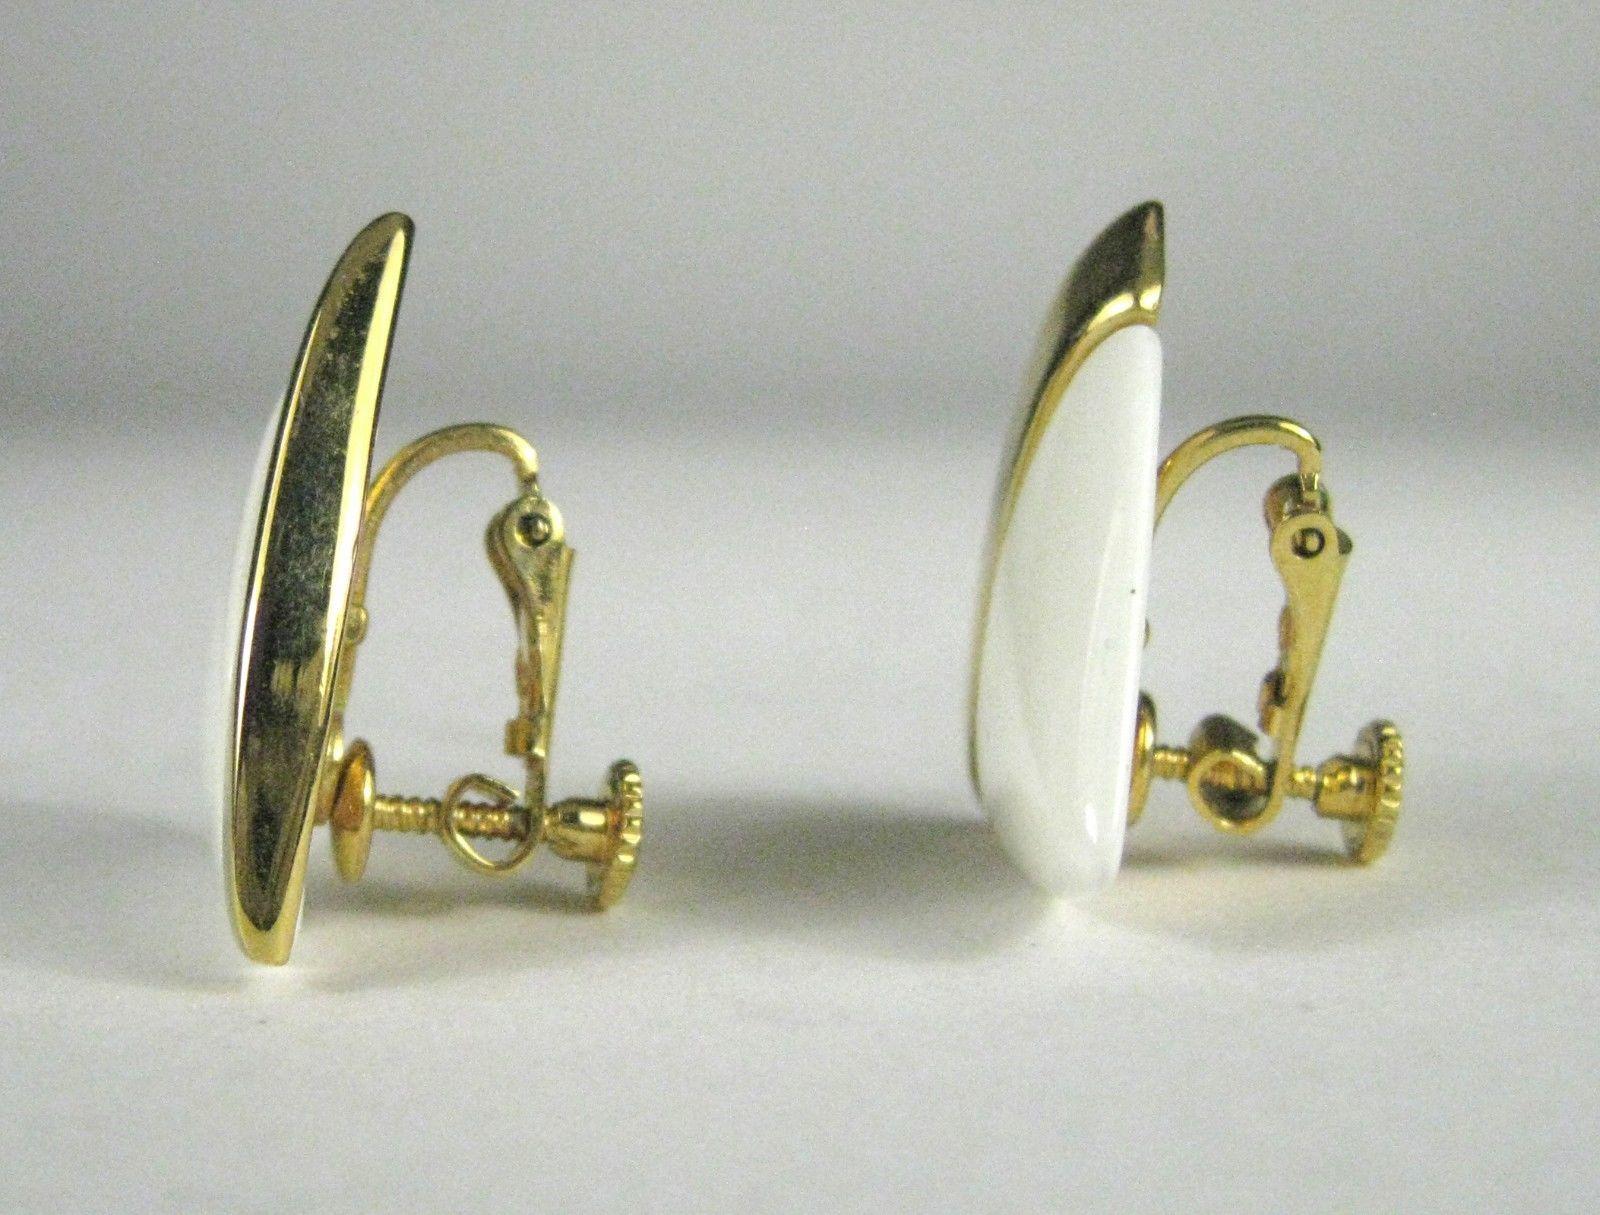 NAPIER Clip Earring Screw Back White Lucite Goldtone Signed VTG Vintage image 2